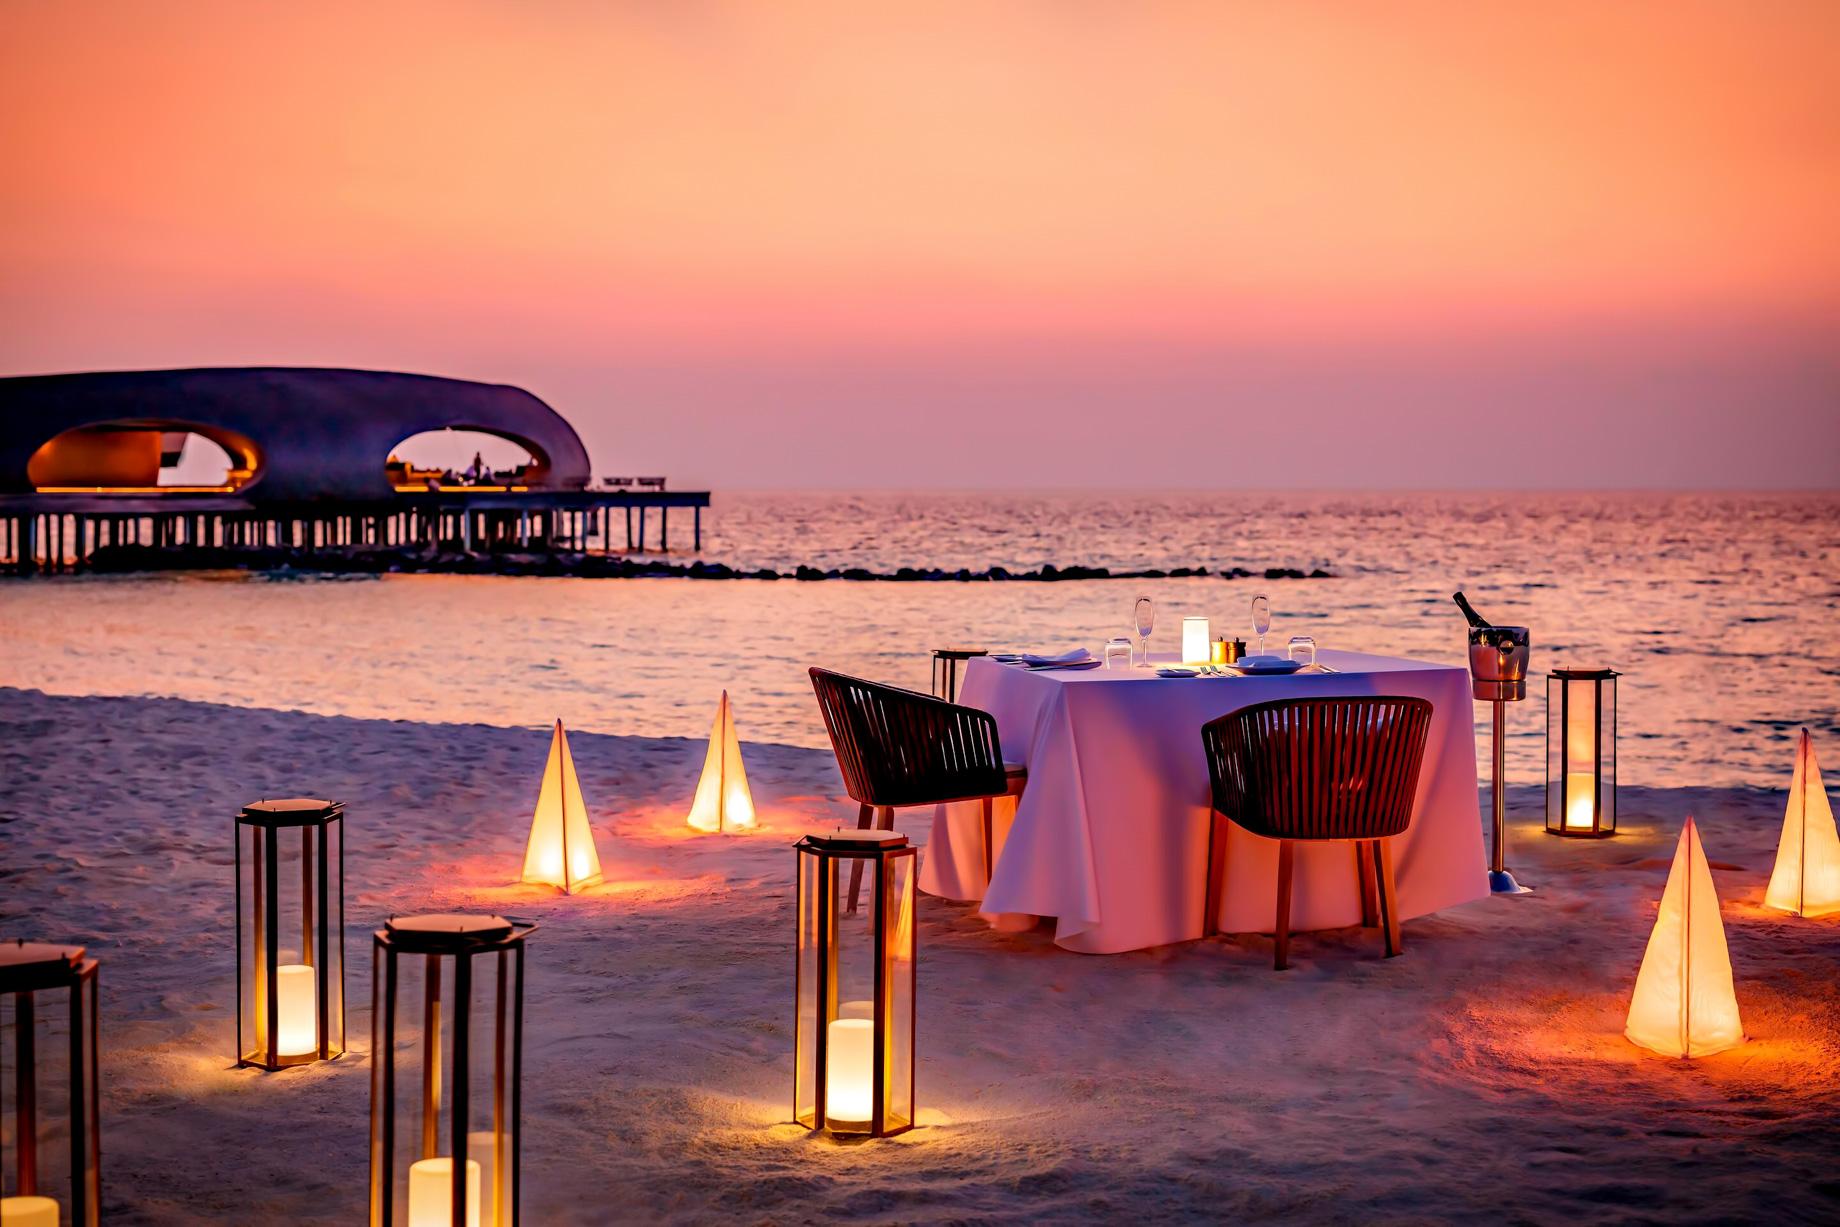 The St. Regis Maldives Vommuli Luxury Resort - Dhaalu Atoll, Maldives - Private Beach Dinner